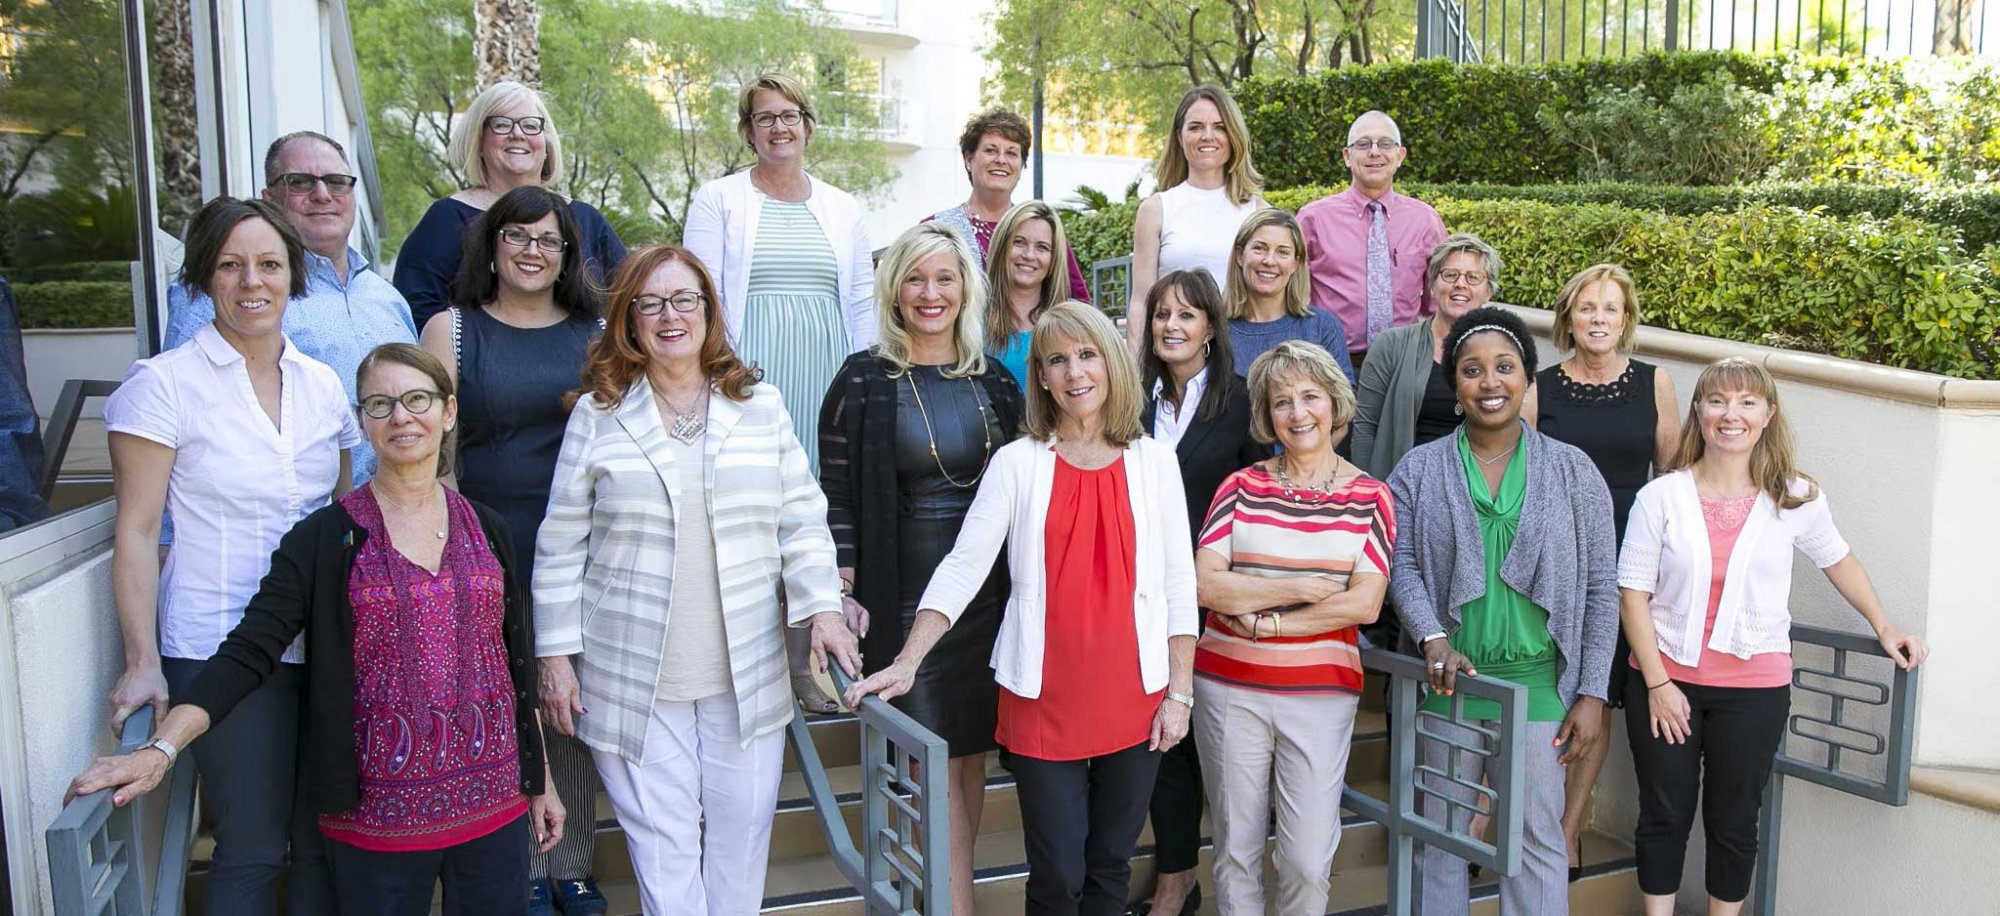 International Myeloma Foundation's Nurse Leadership Board members pose for a group photo